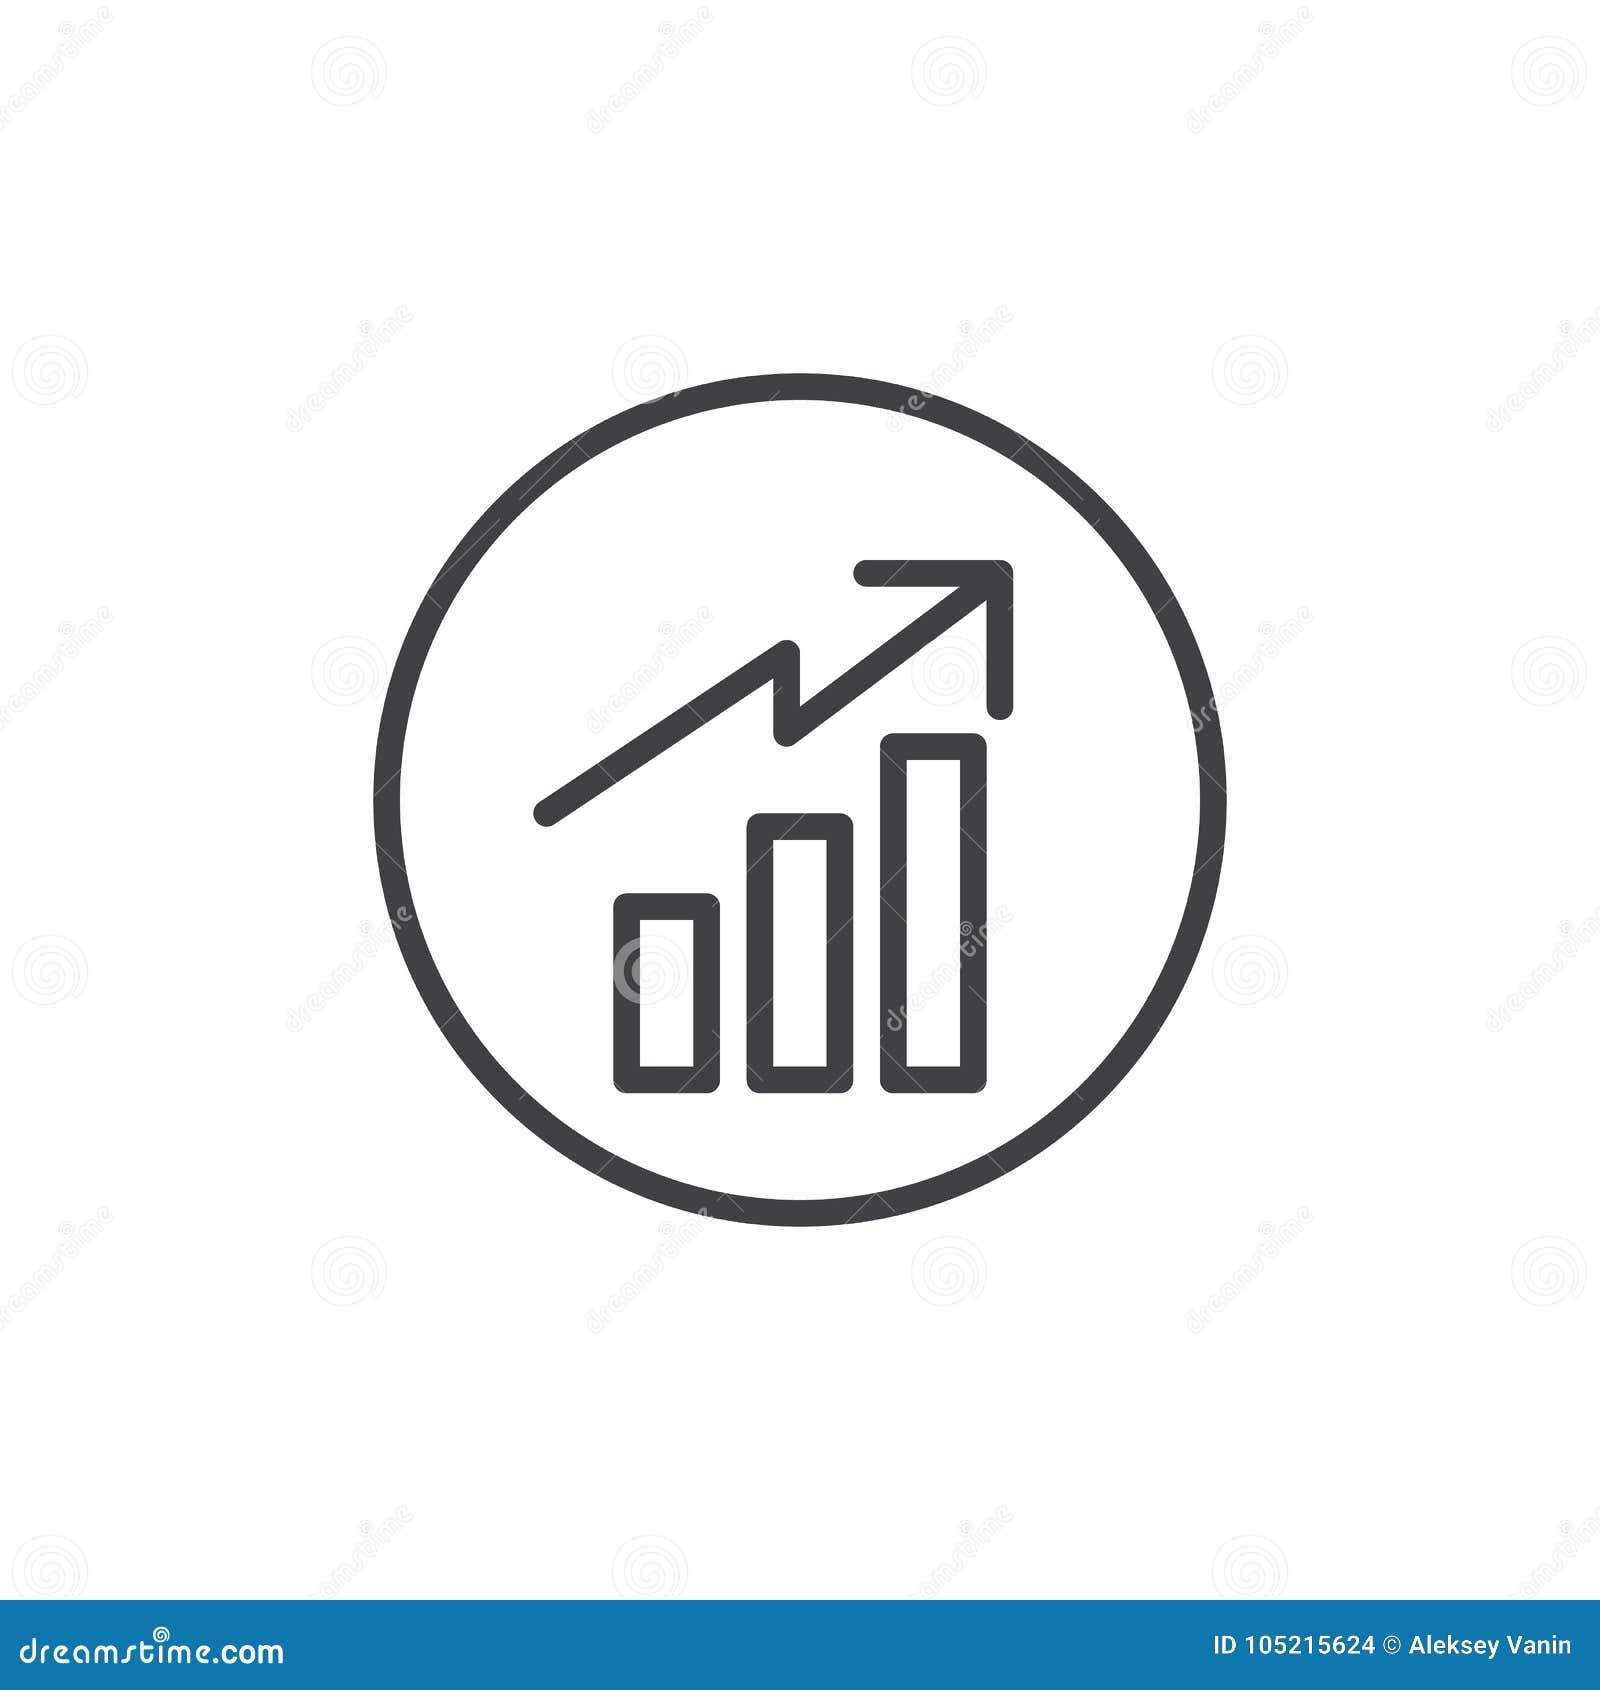 Business graph line icon